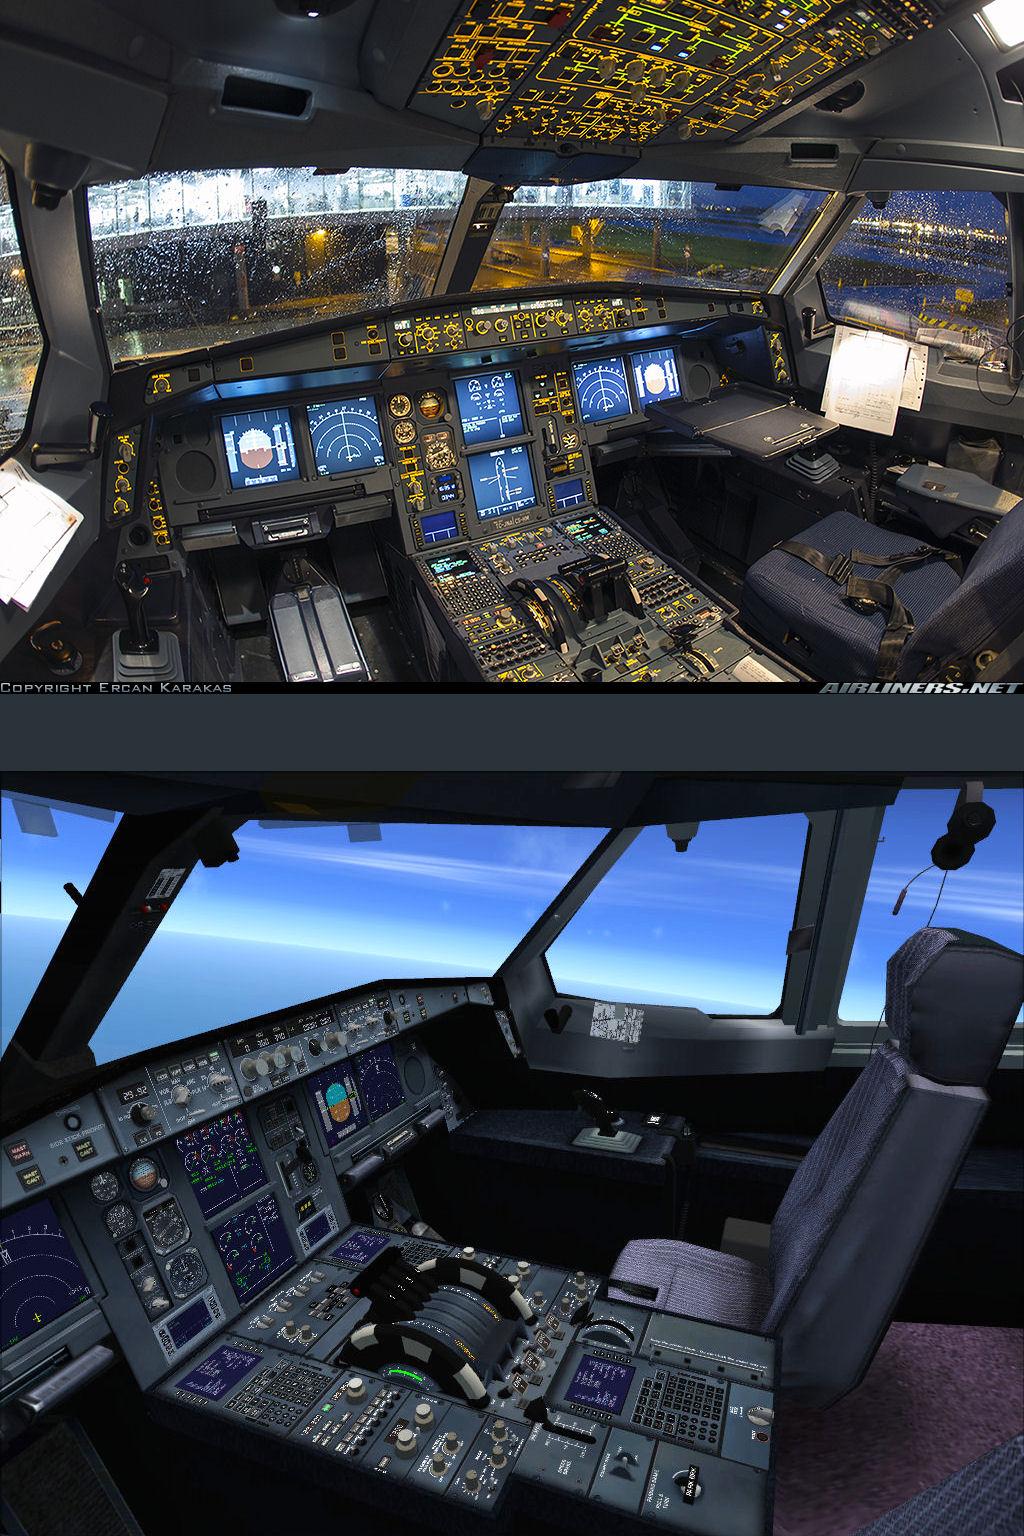 fs-freeware net - Cockpit